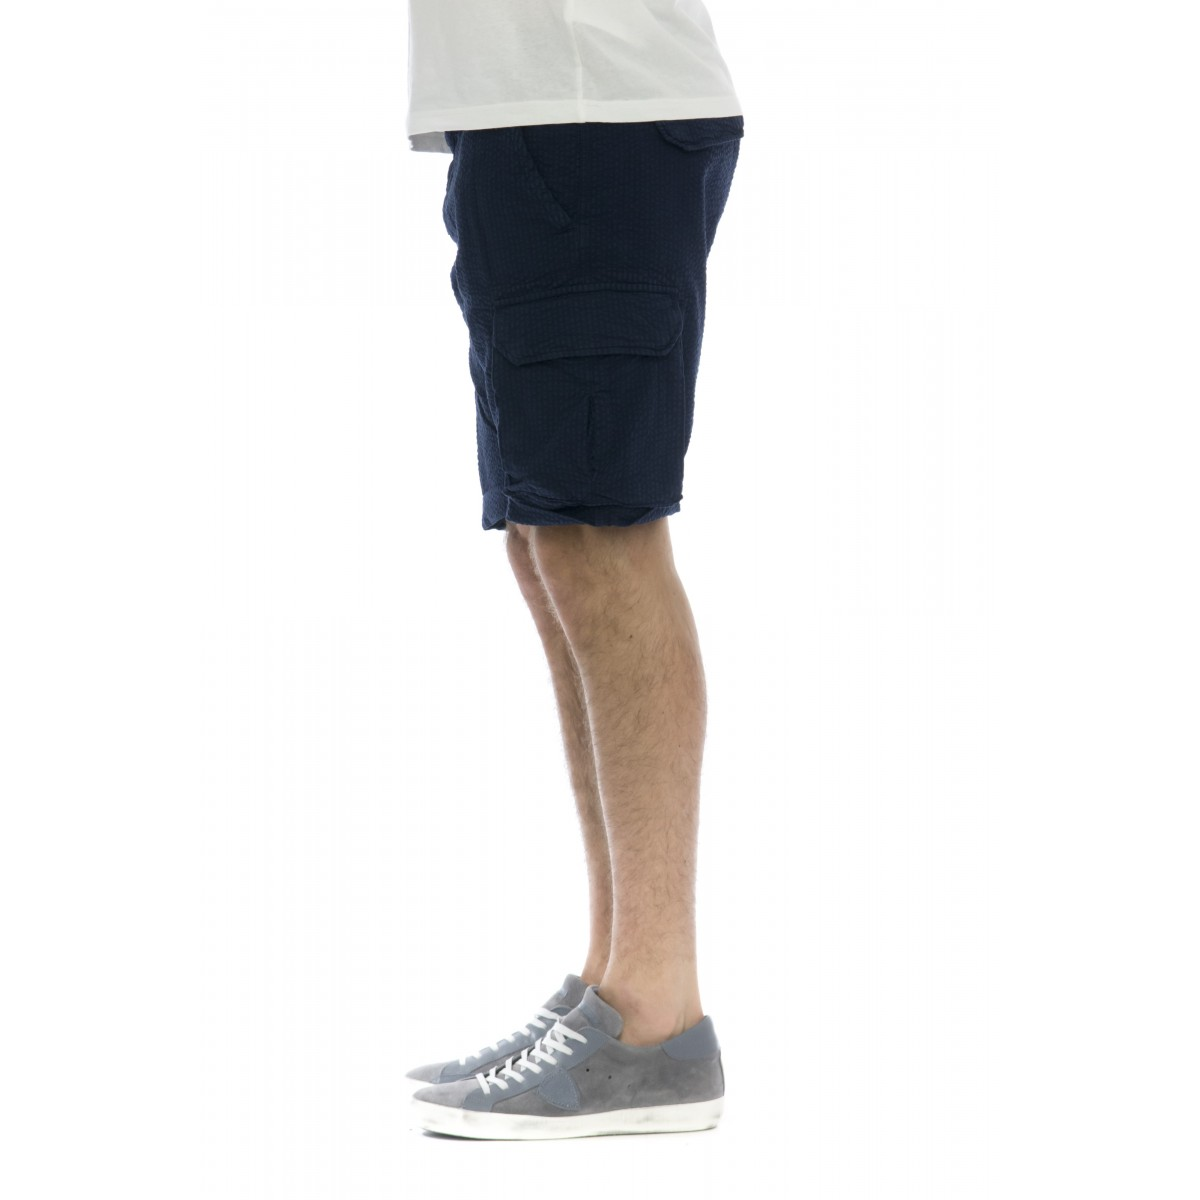 Bermuda uomo - Nick 4127 sirsacher